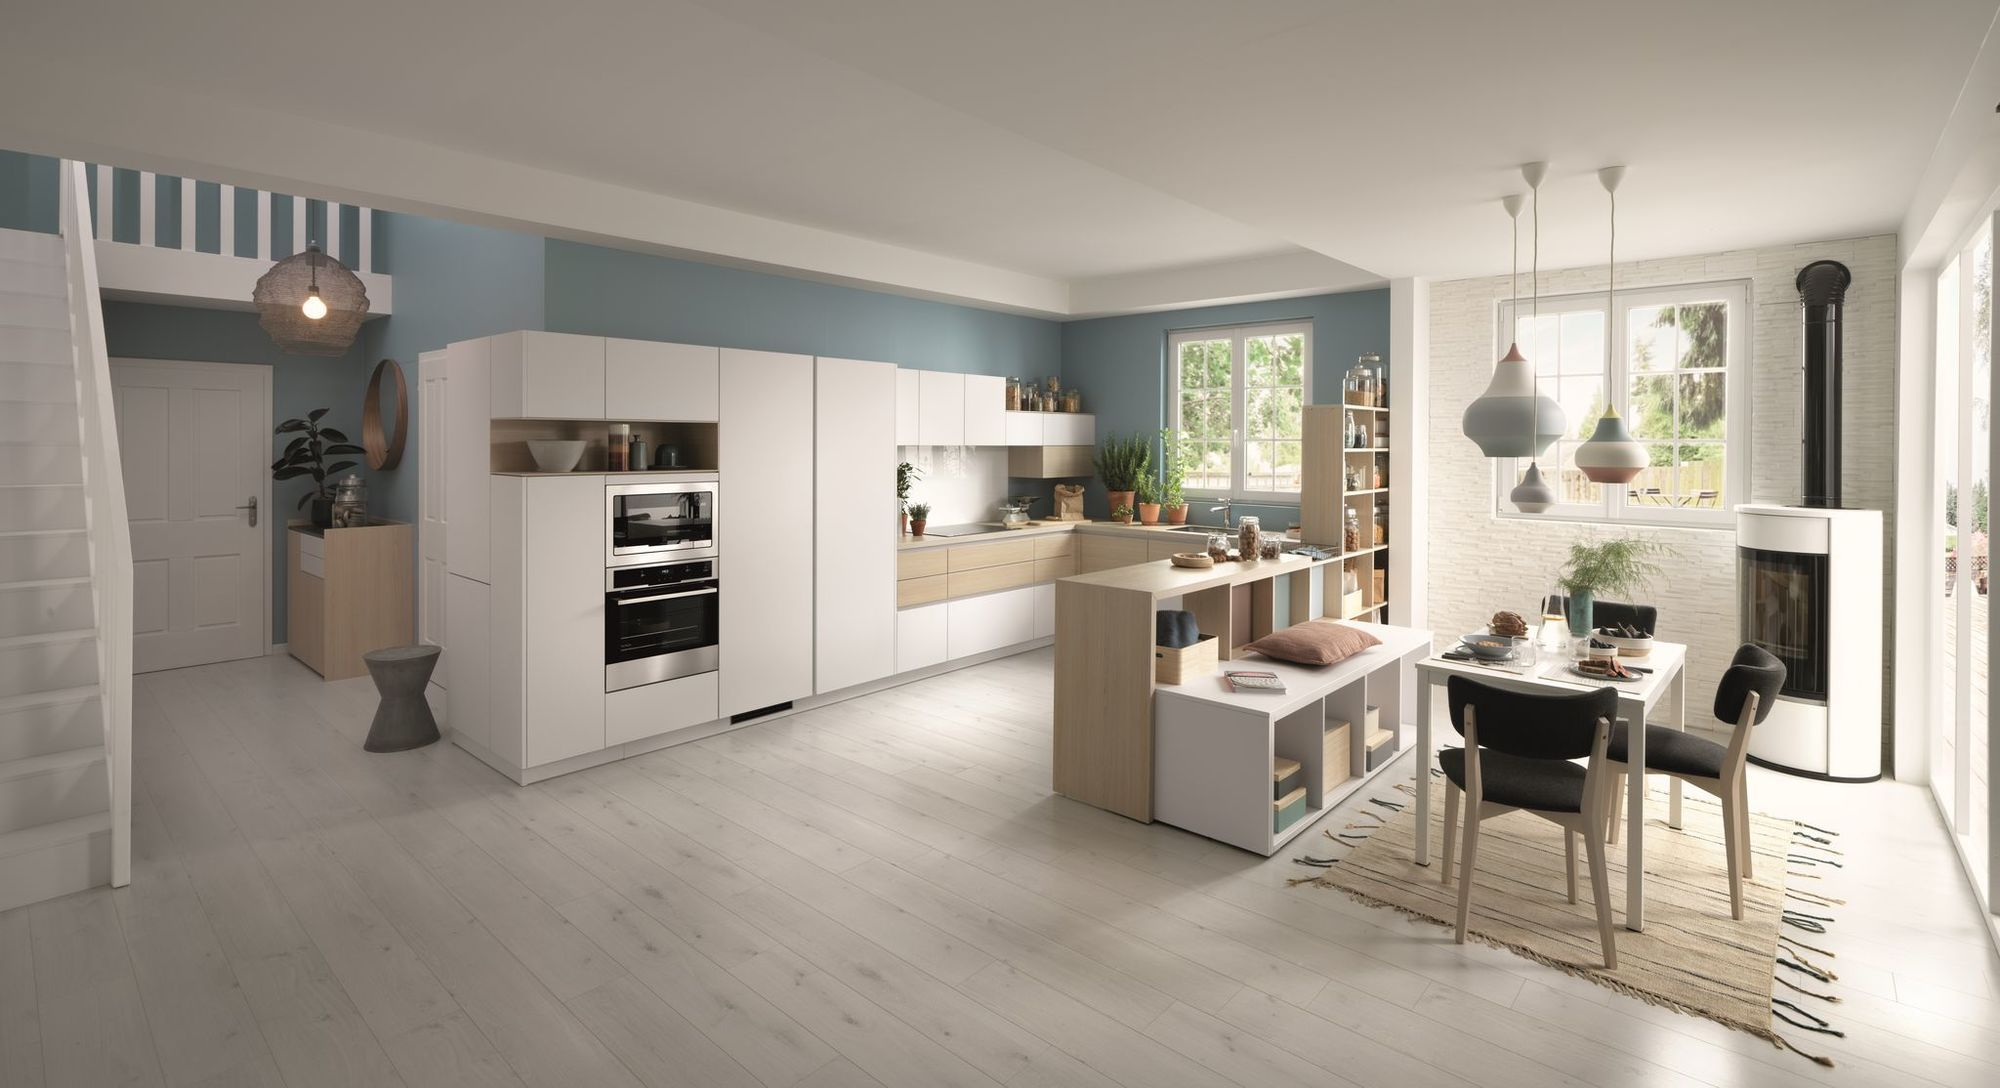 Tendance Cuisine 2020 Amenagement Et Deco Cuisine Blanche Et Bois Cuisine Moderne Cuisine Tendance